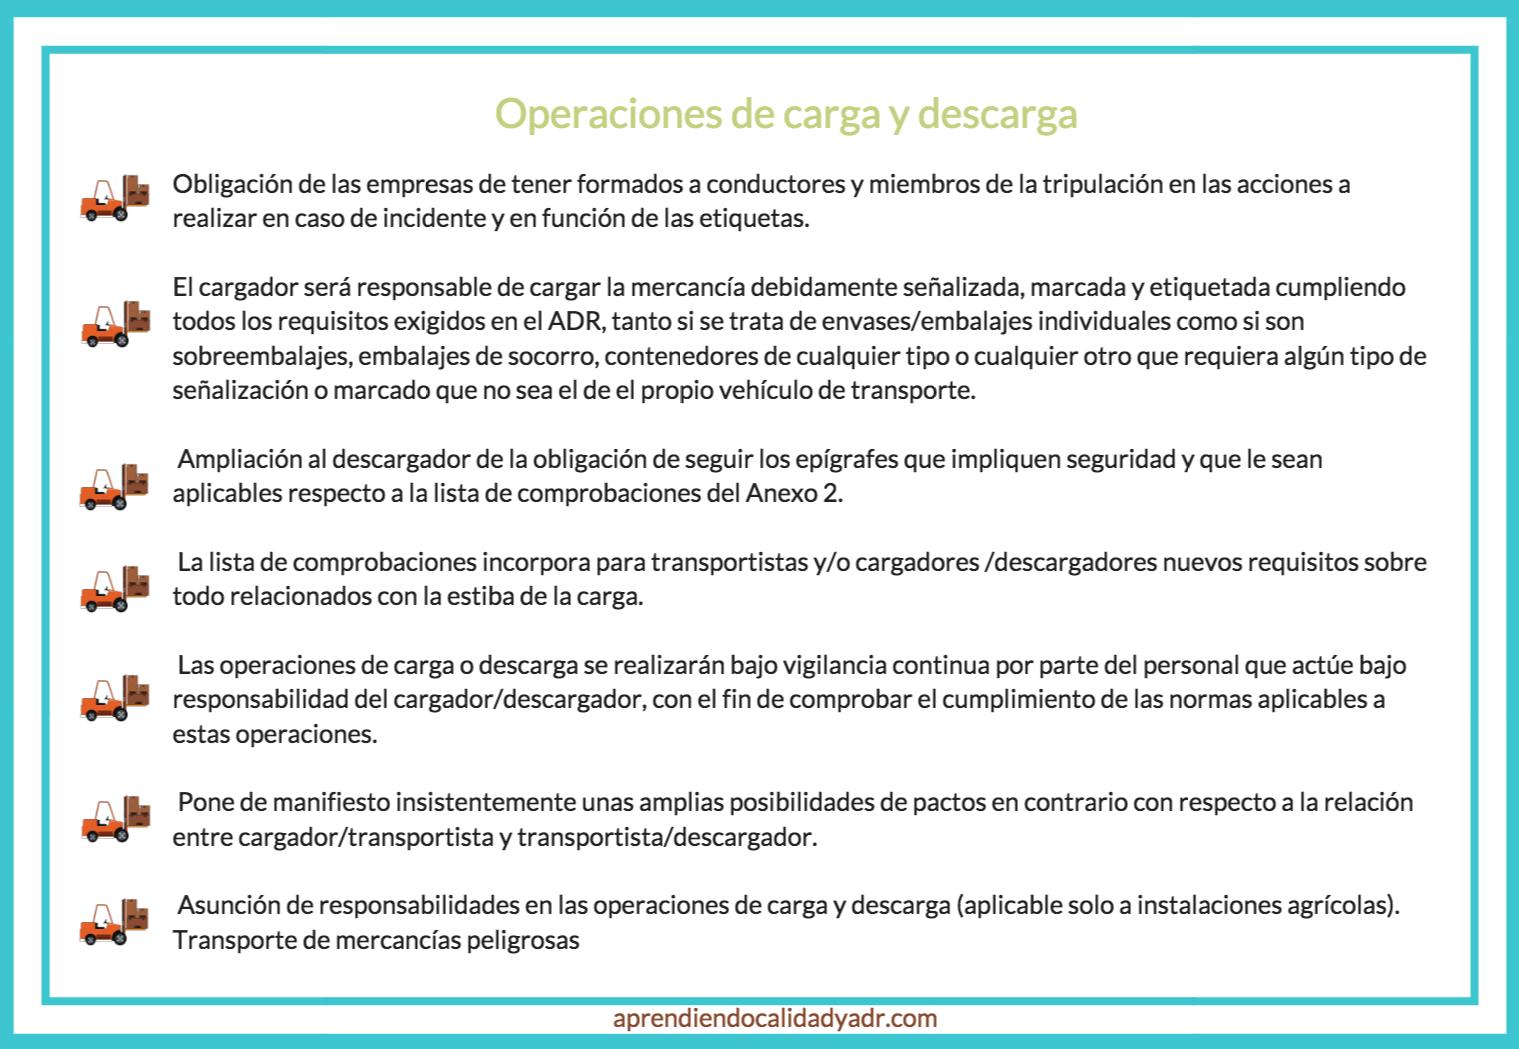 real decreto 97/2014